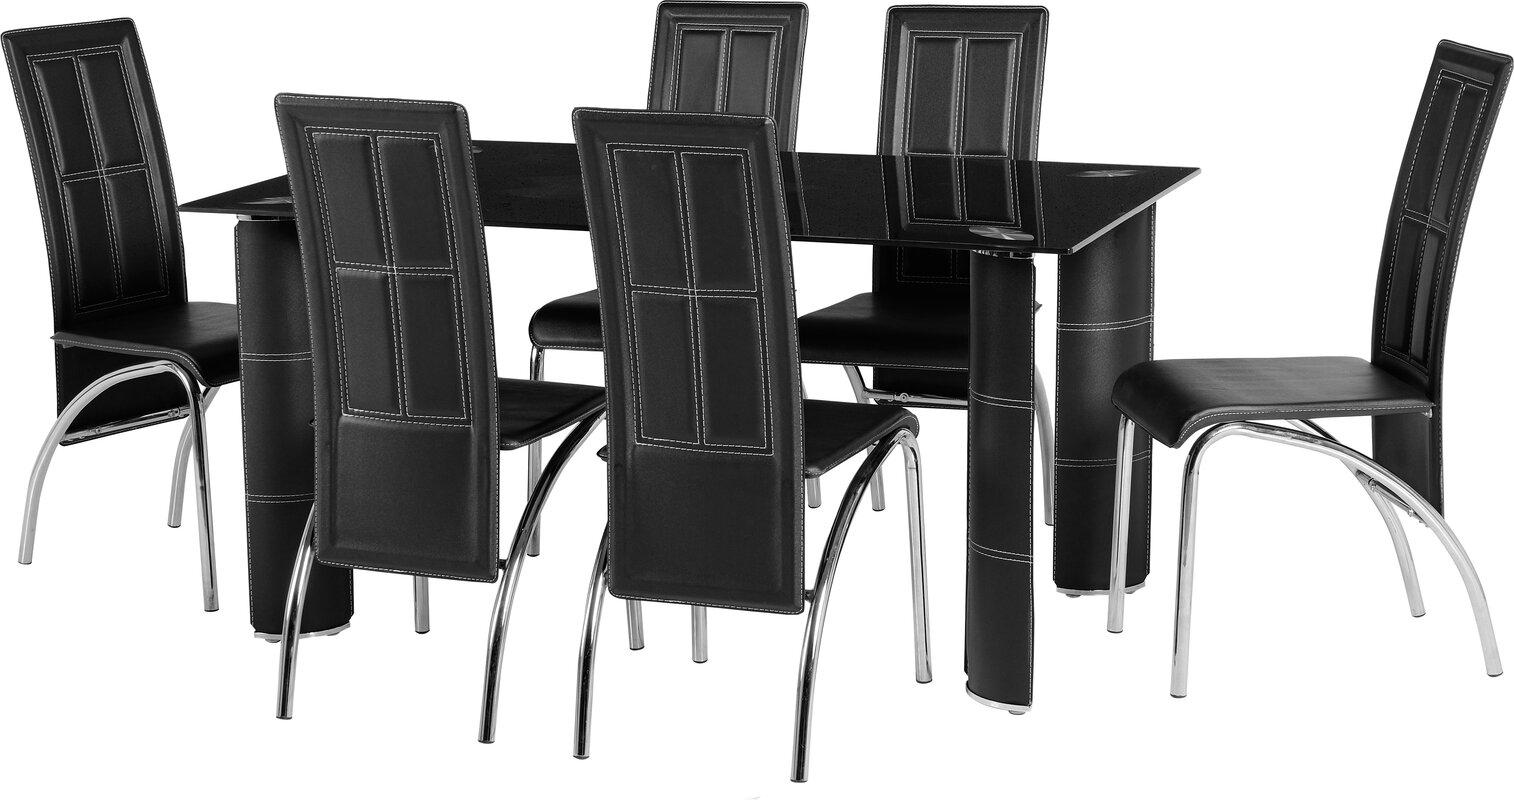 dcor design essgruppe meadows mit 6 st hlen bewertungen. Black Bedroom Furniture Sets. Home Design Ideas